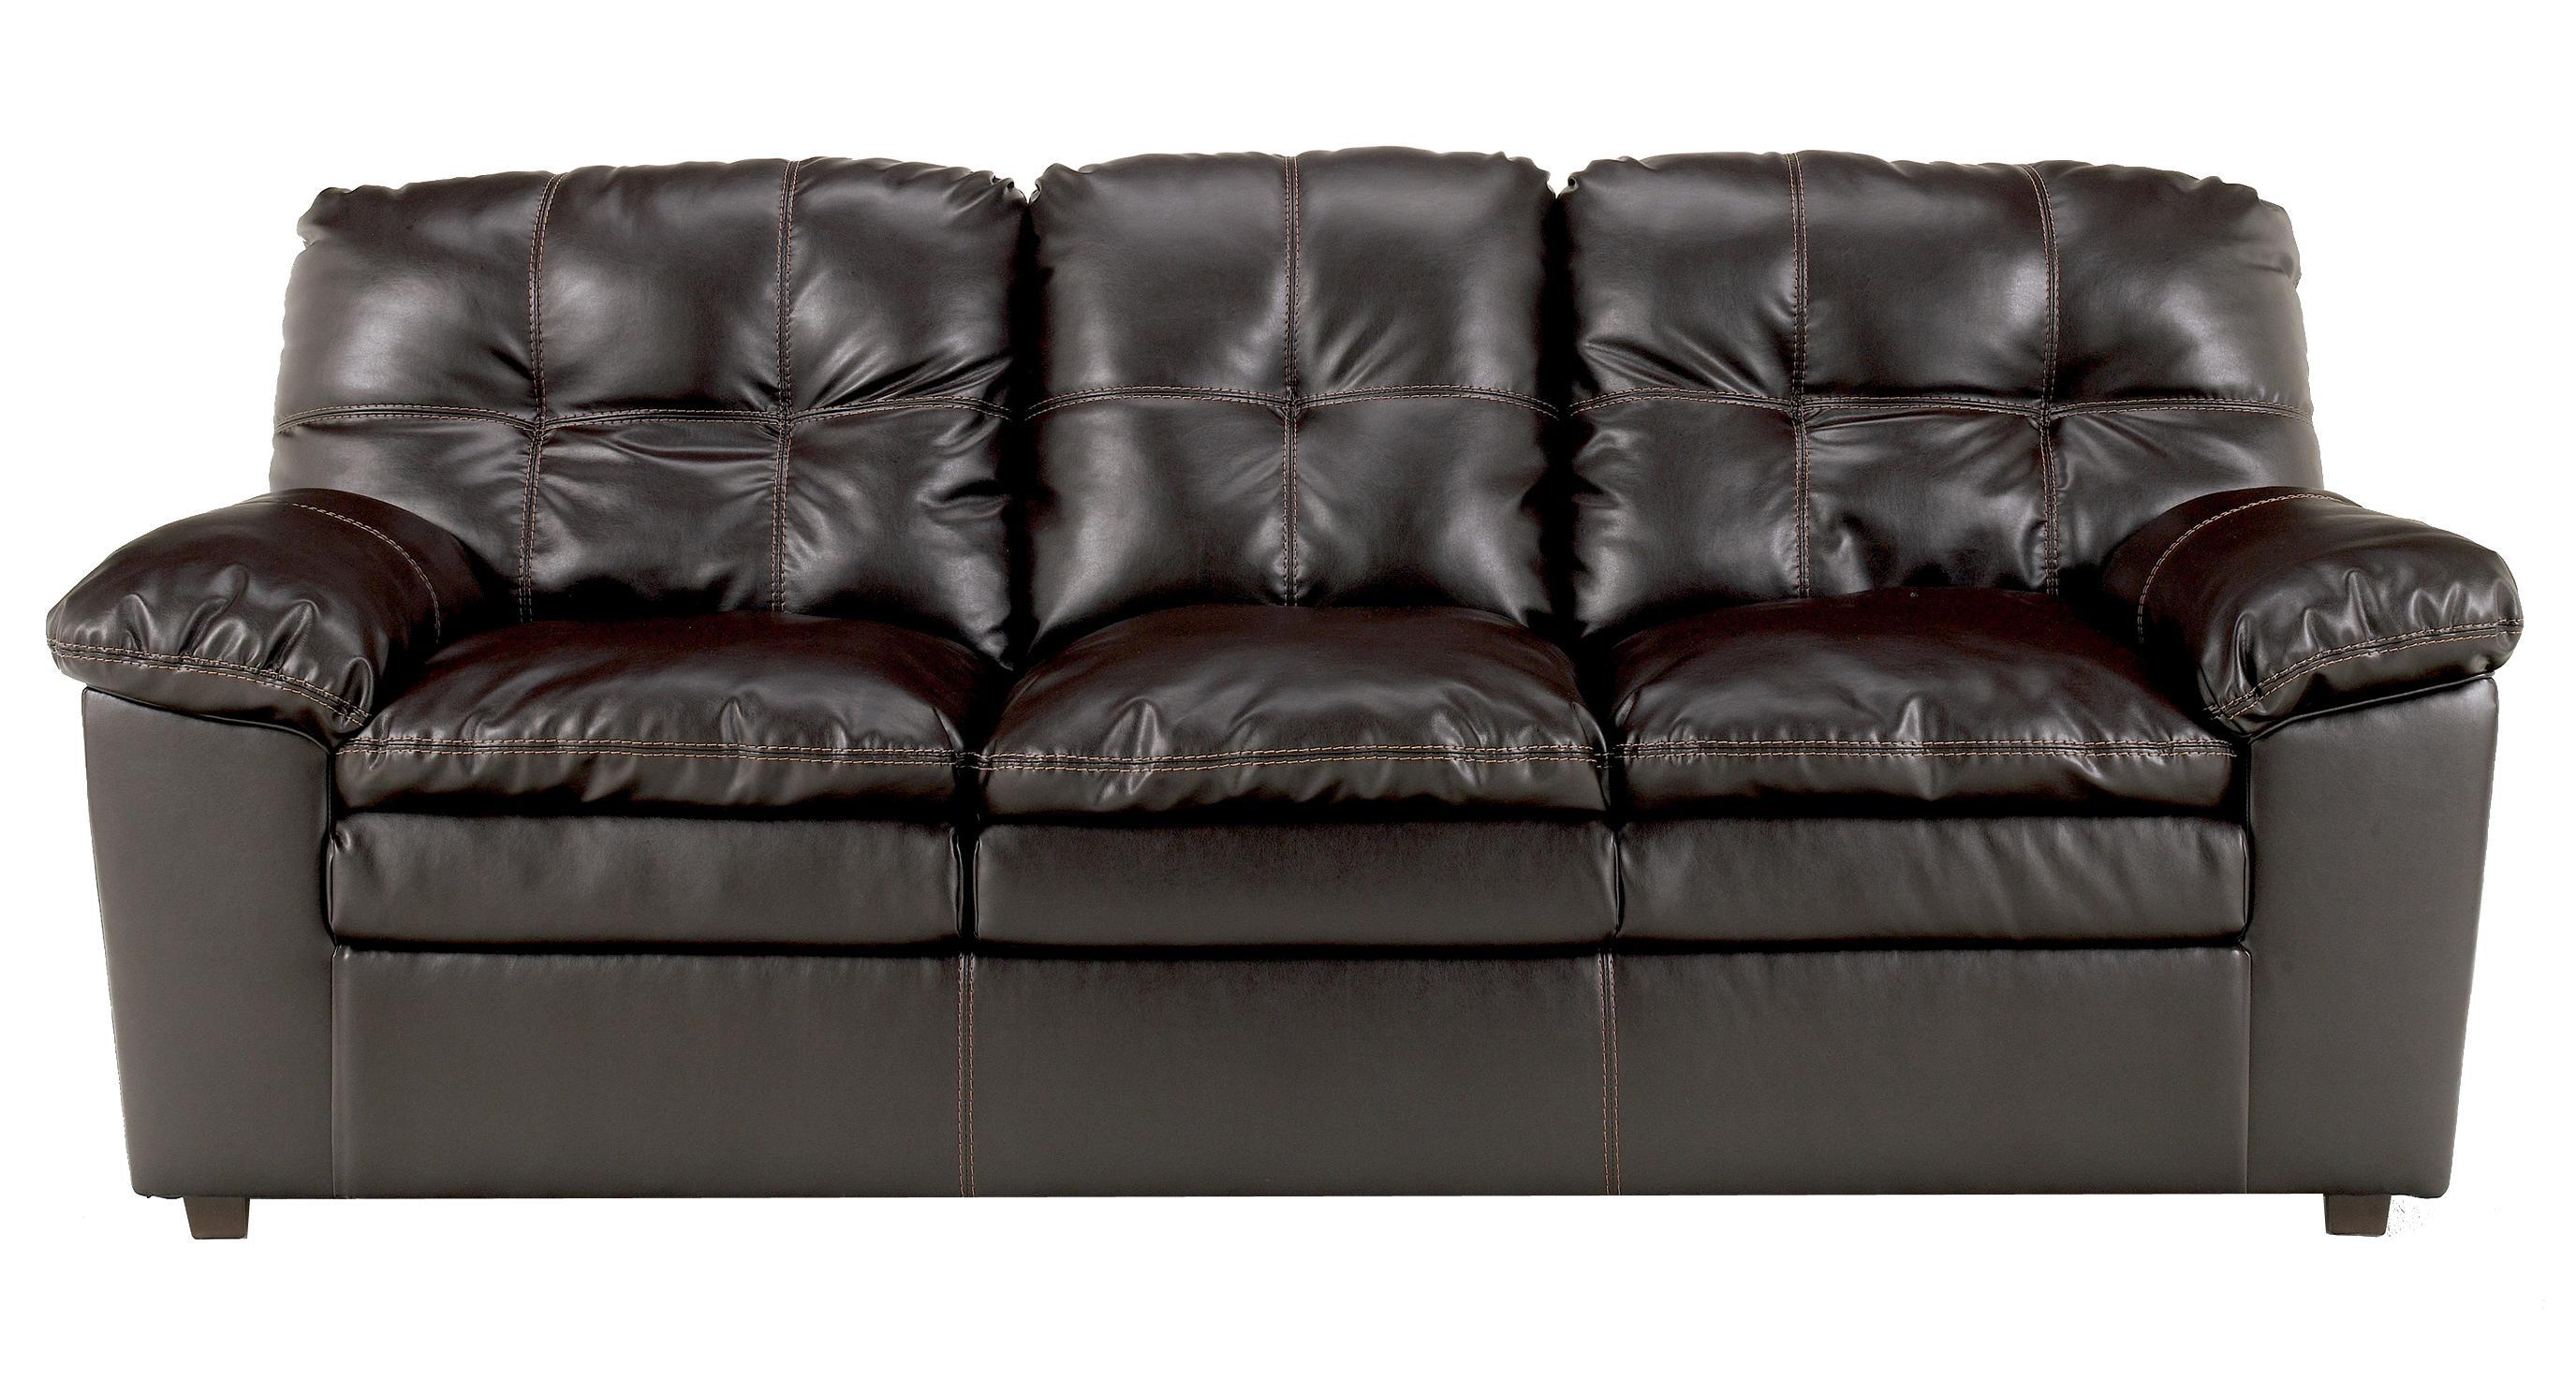 Signature Design by Ashley Jordon DuraBlend - Java Sofa - Item Number: 1230038